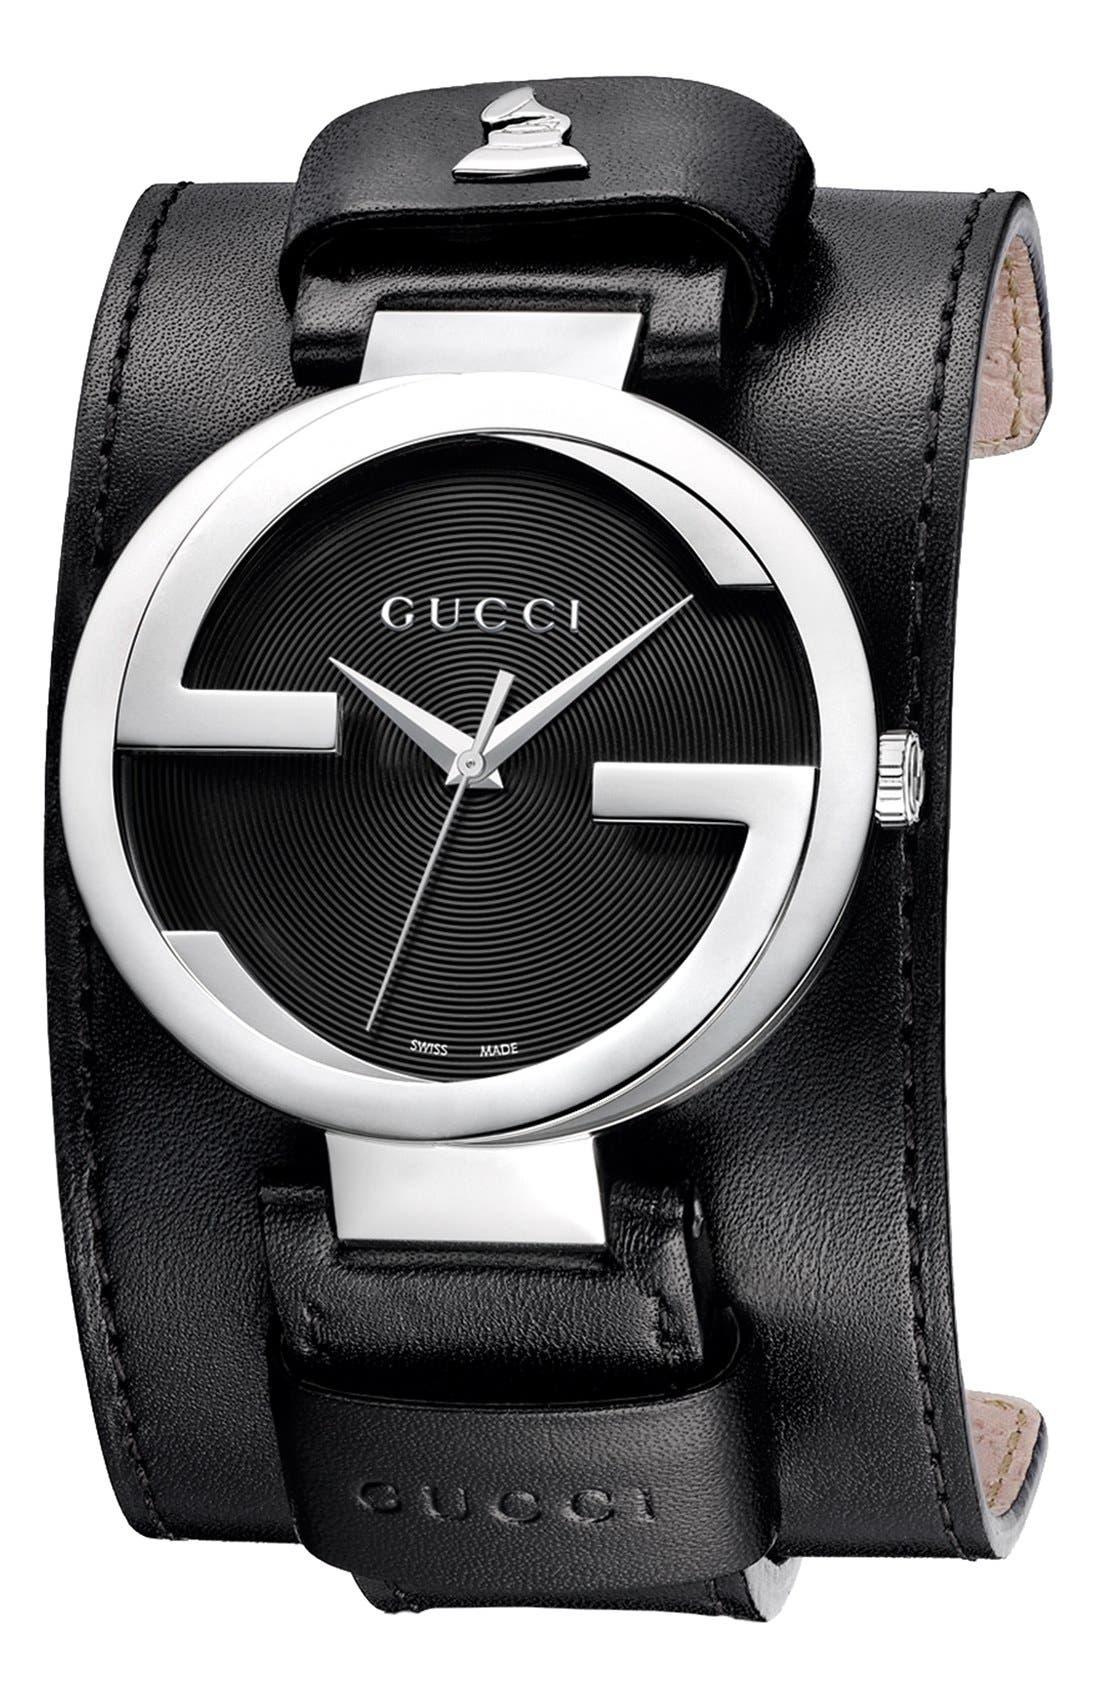 Alternate Image 1 Selected - Gucci 'Interlocking G - GRAMMY®' Leather Cuff Watch, 42mm